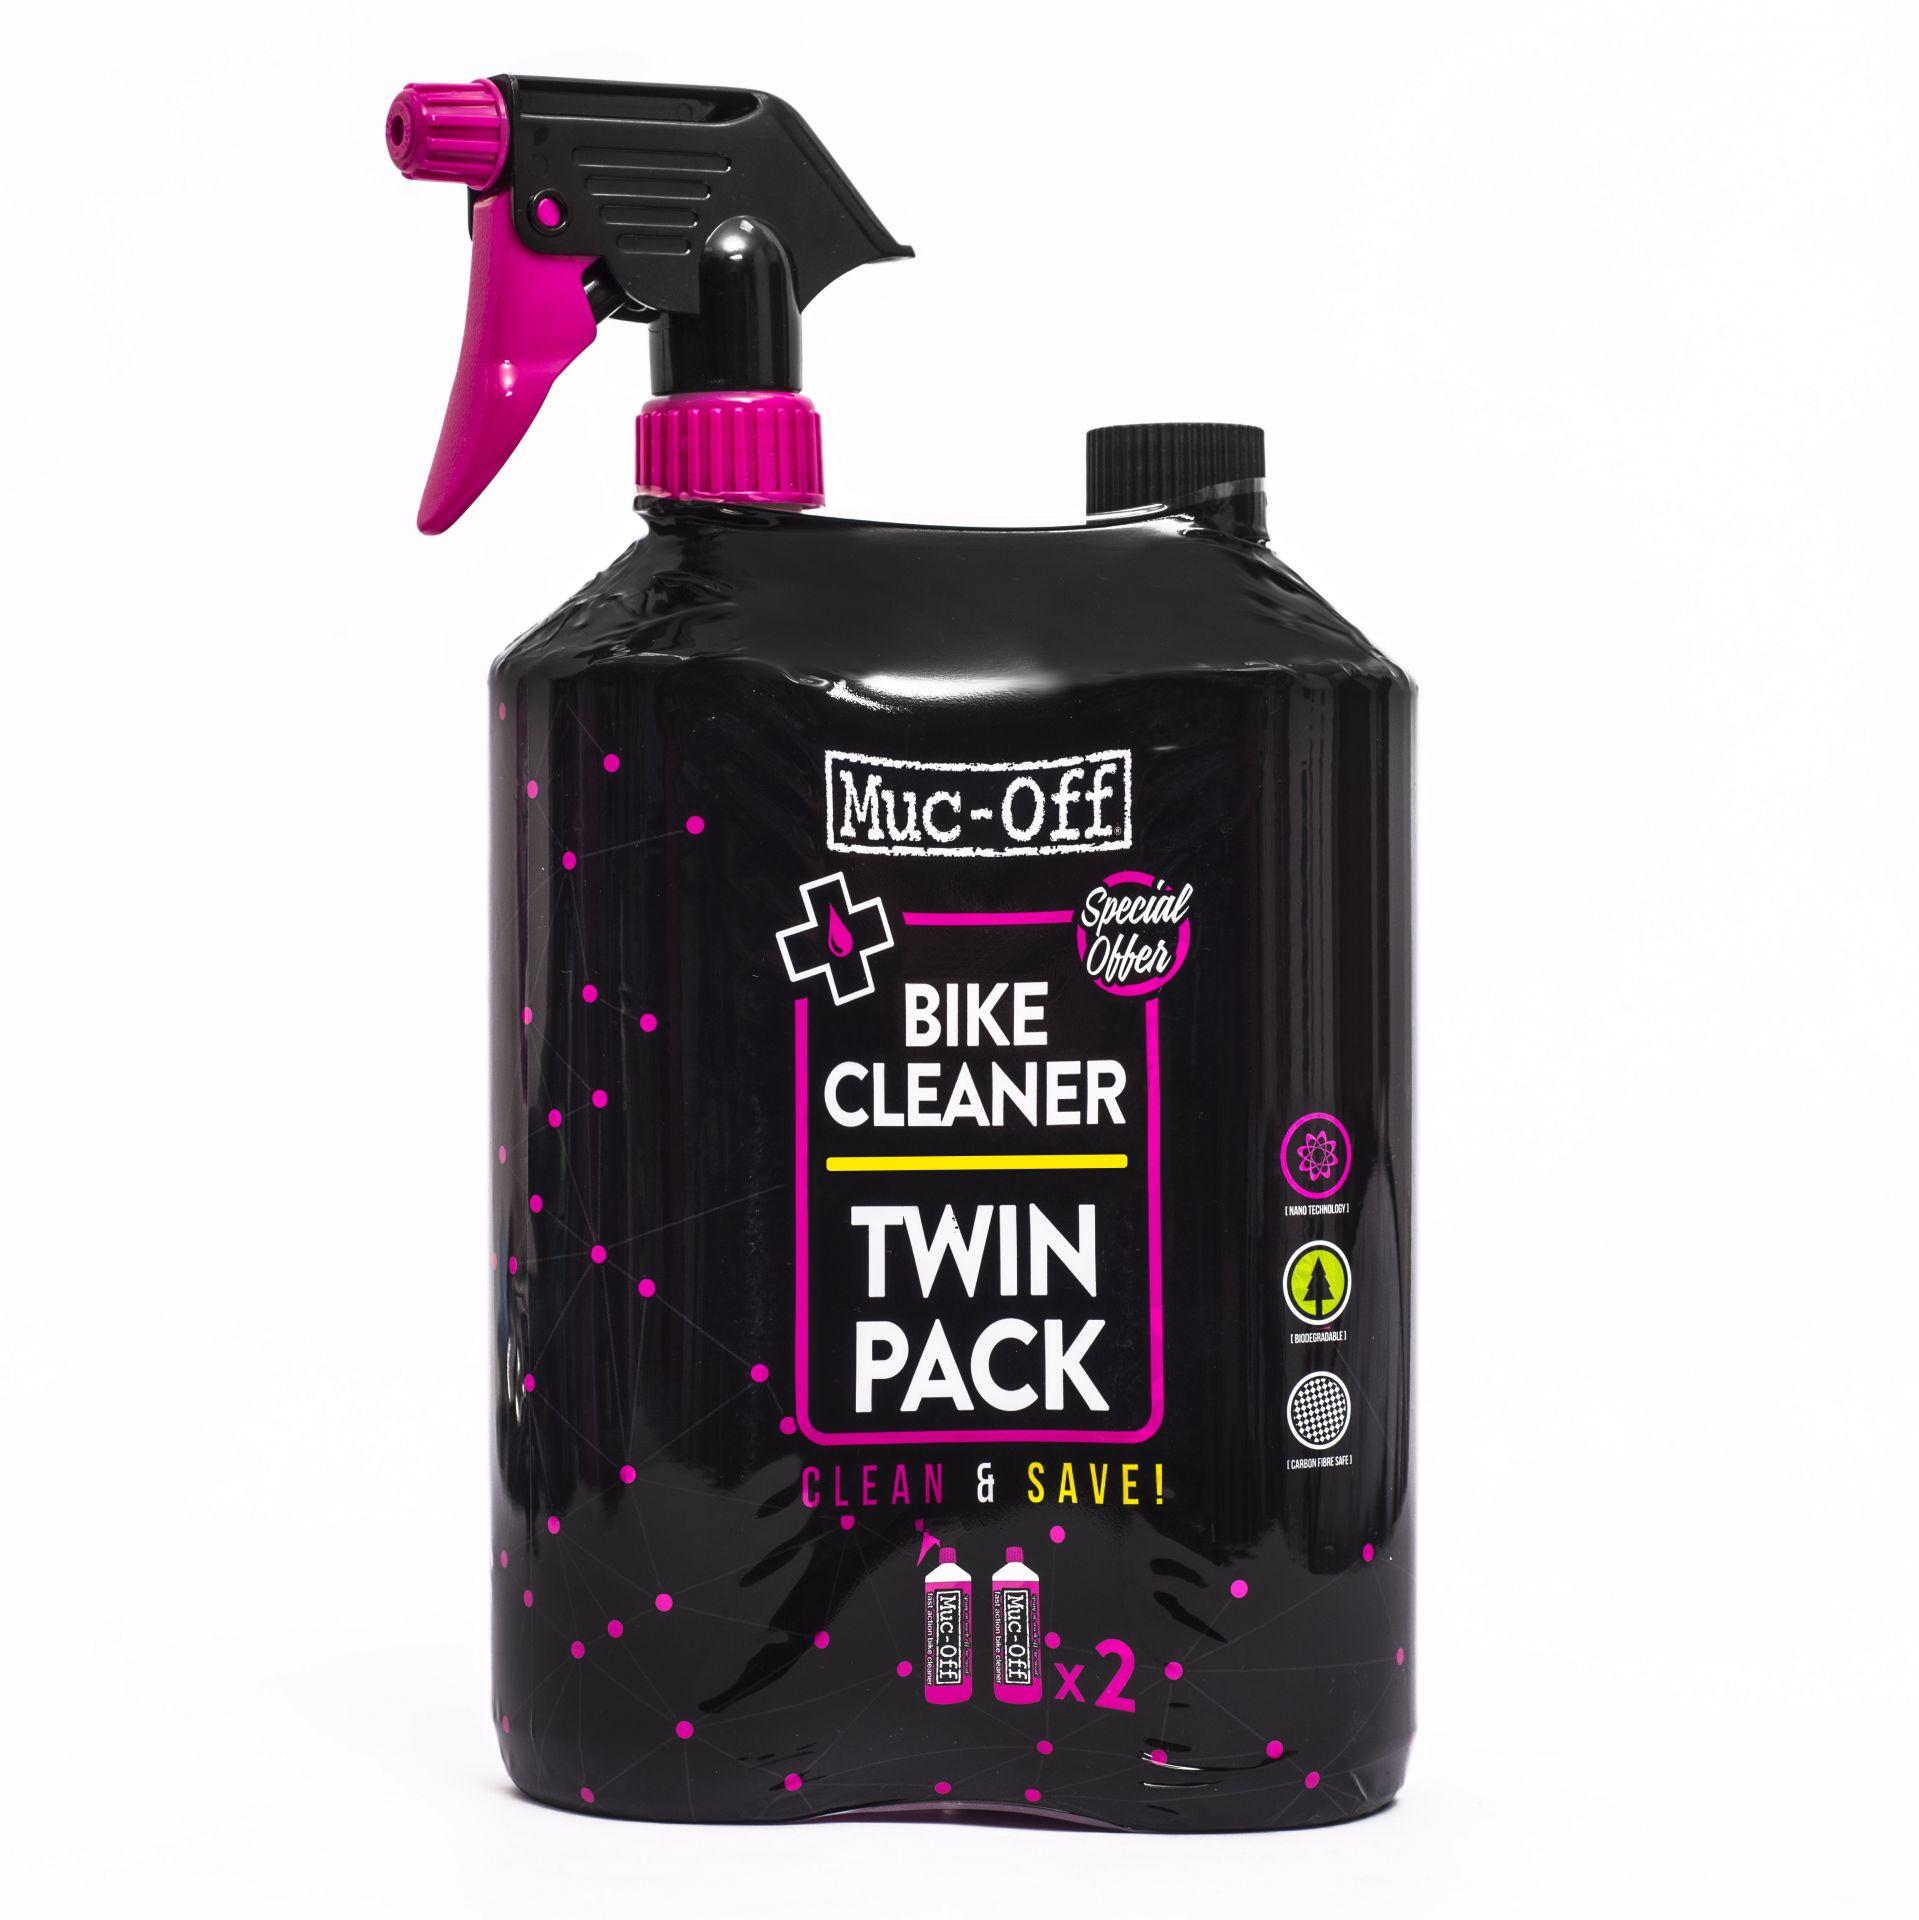 Nettoyant pour vélo Muc-Off Nano Tech Bike Cleaner Pack 2x 1 L